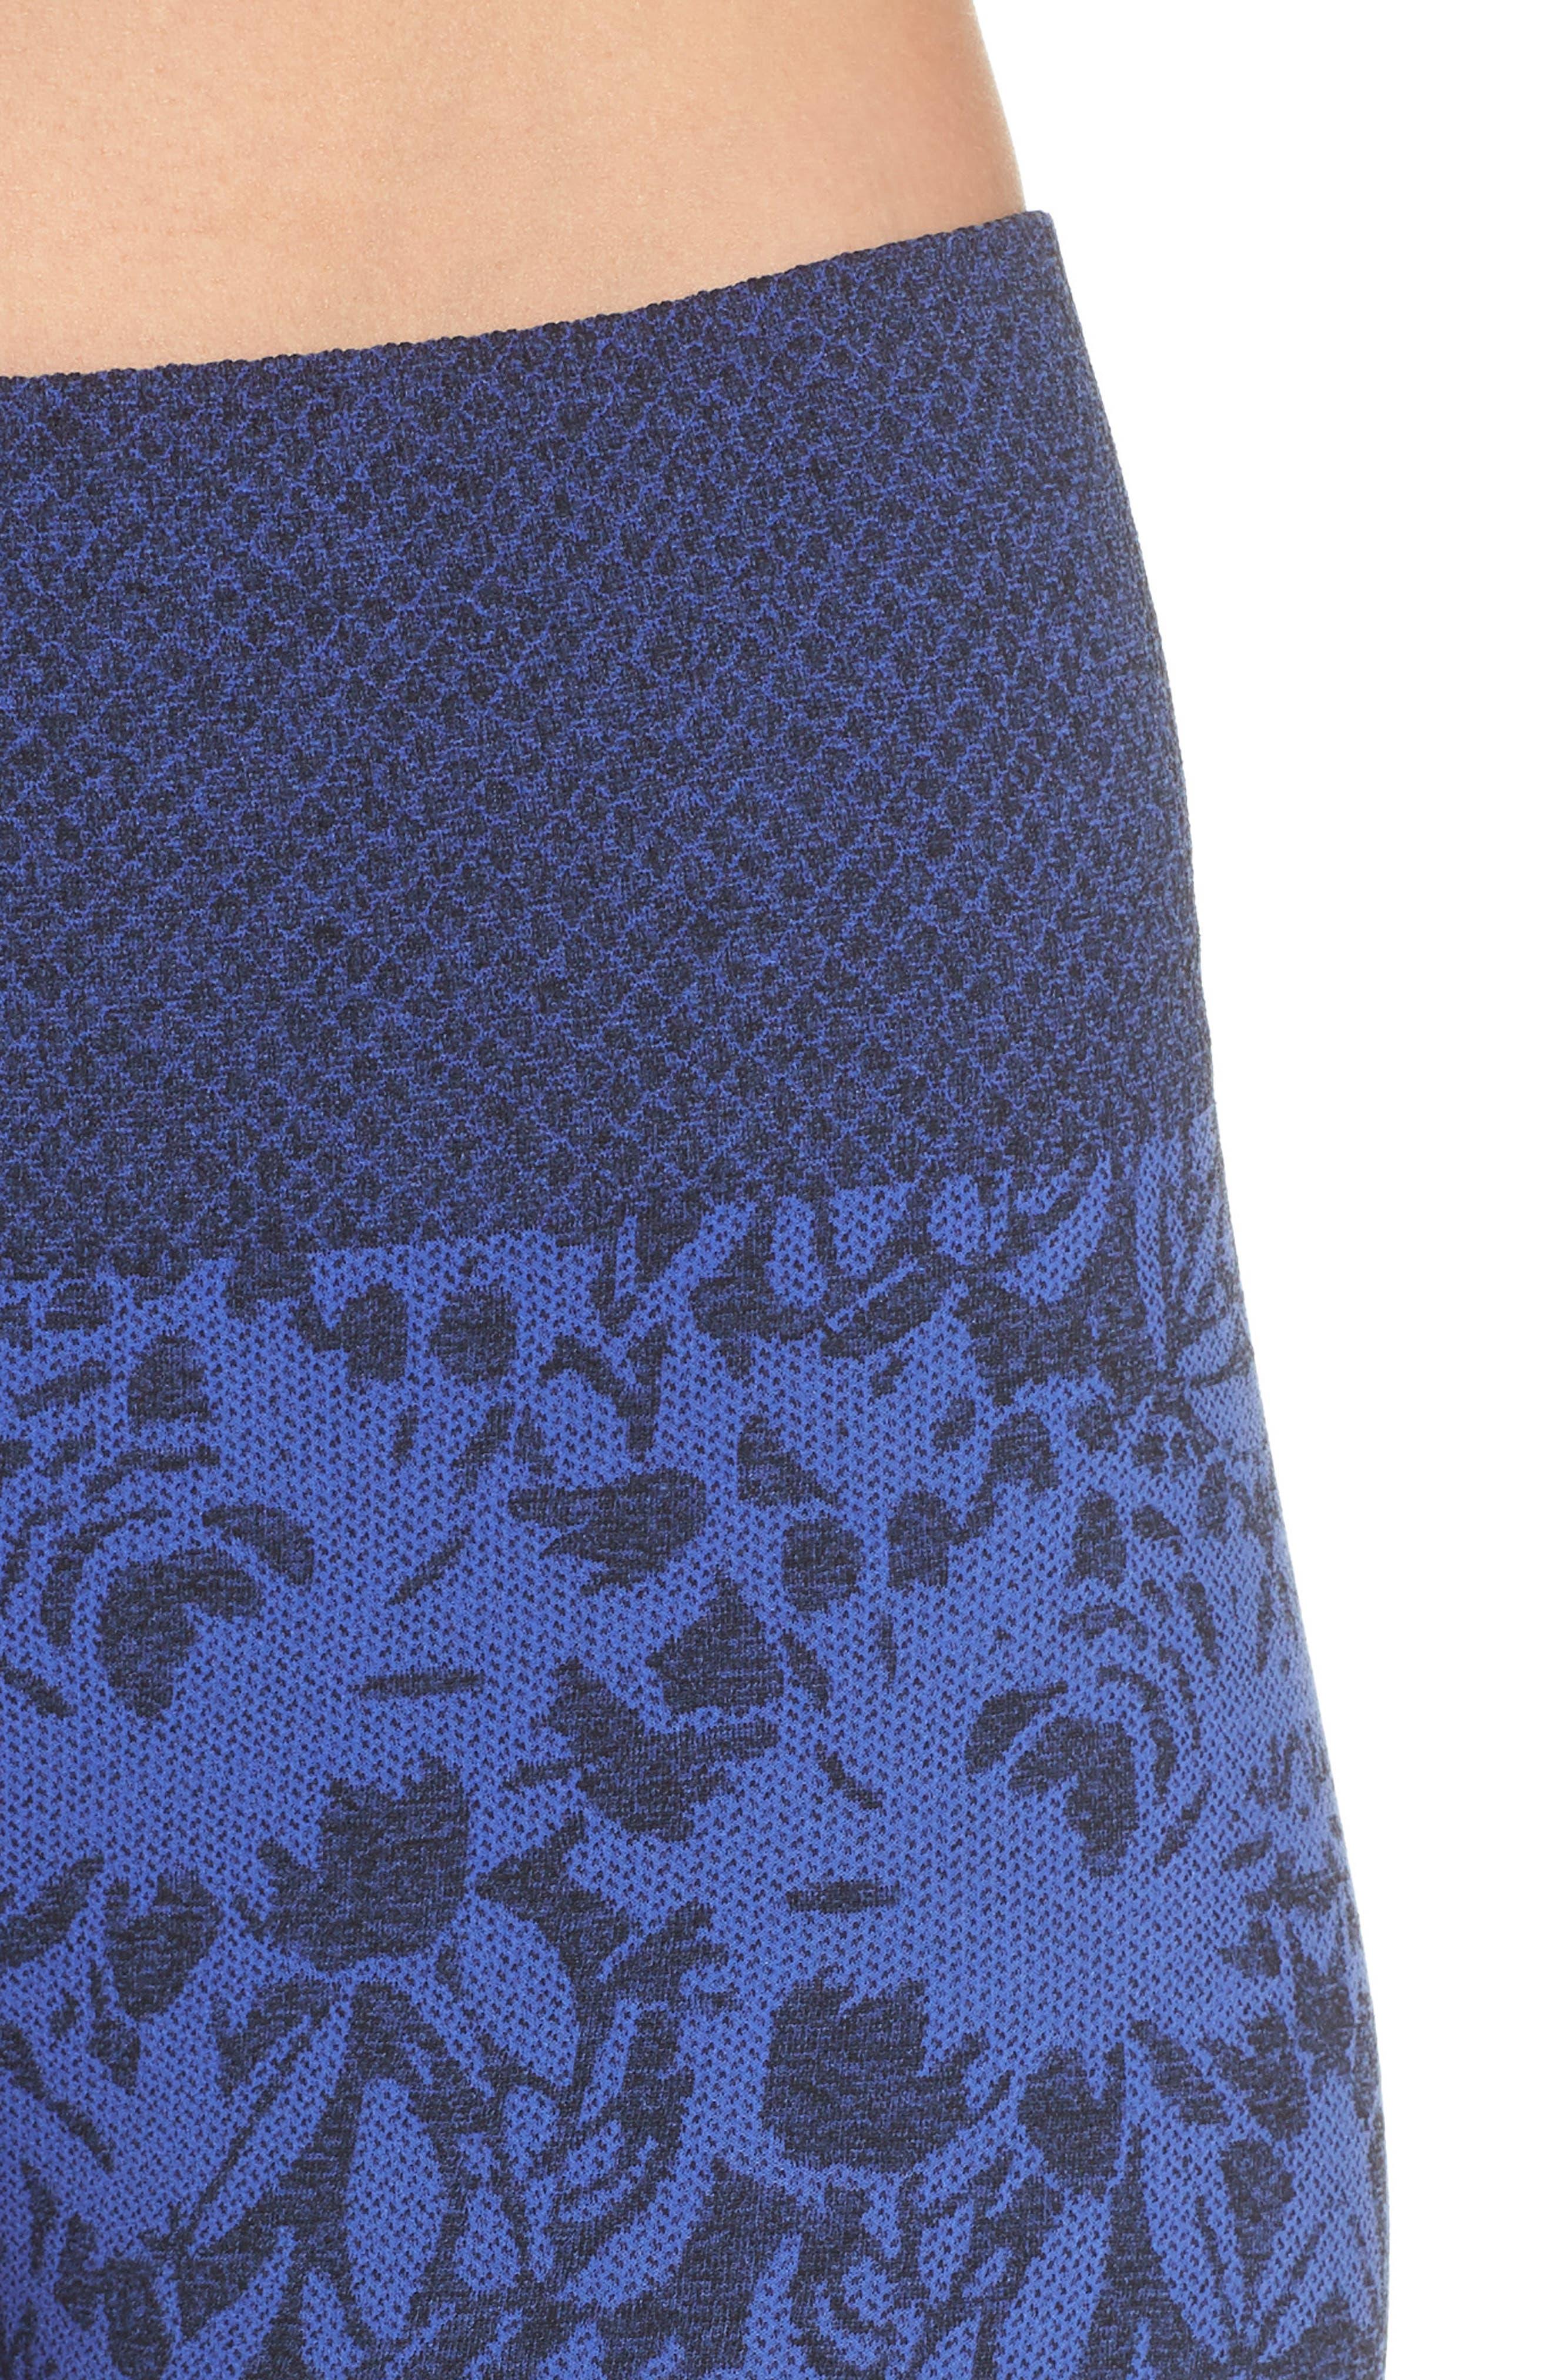 Pathway Capri Leggings,                             Alternate thumbnail 4, color,                             AMPARO BLUE/ BLACK MELANGE